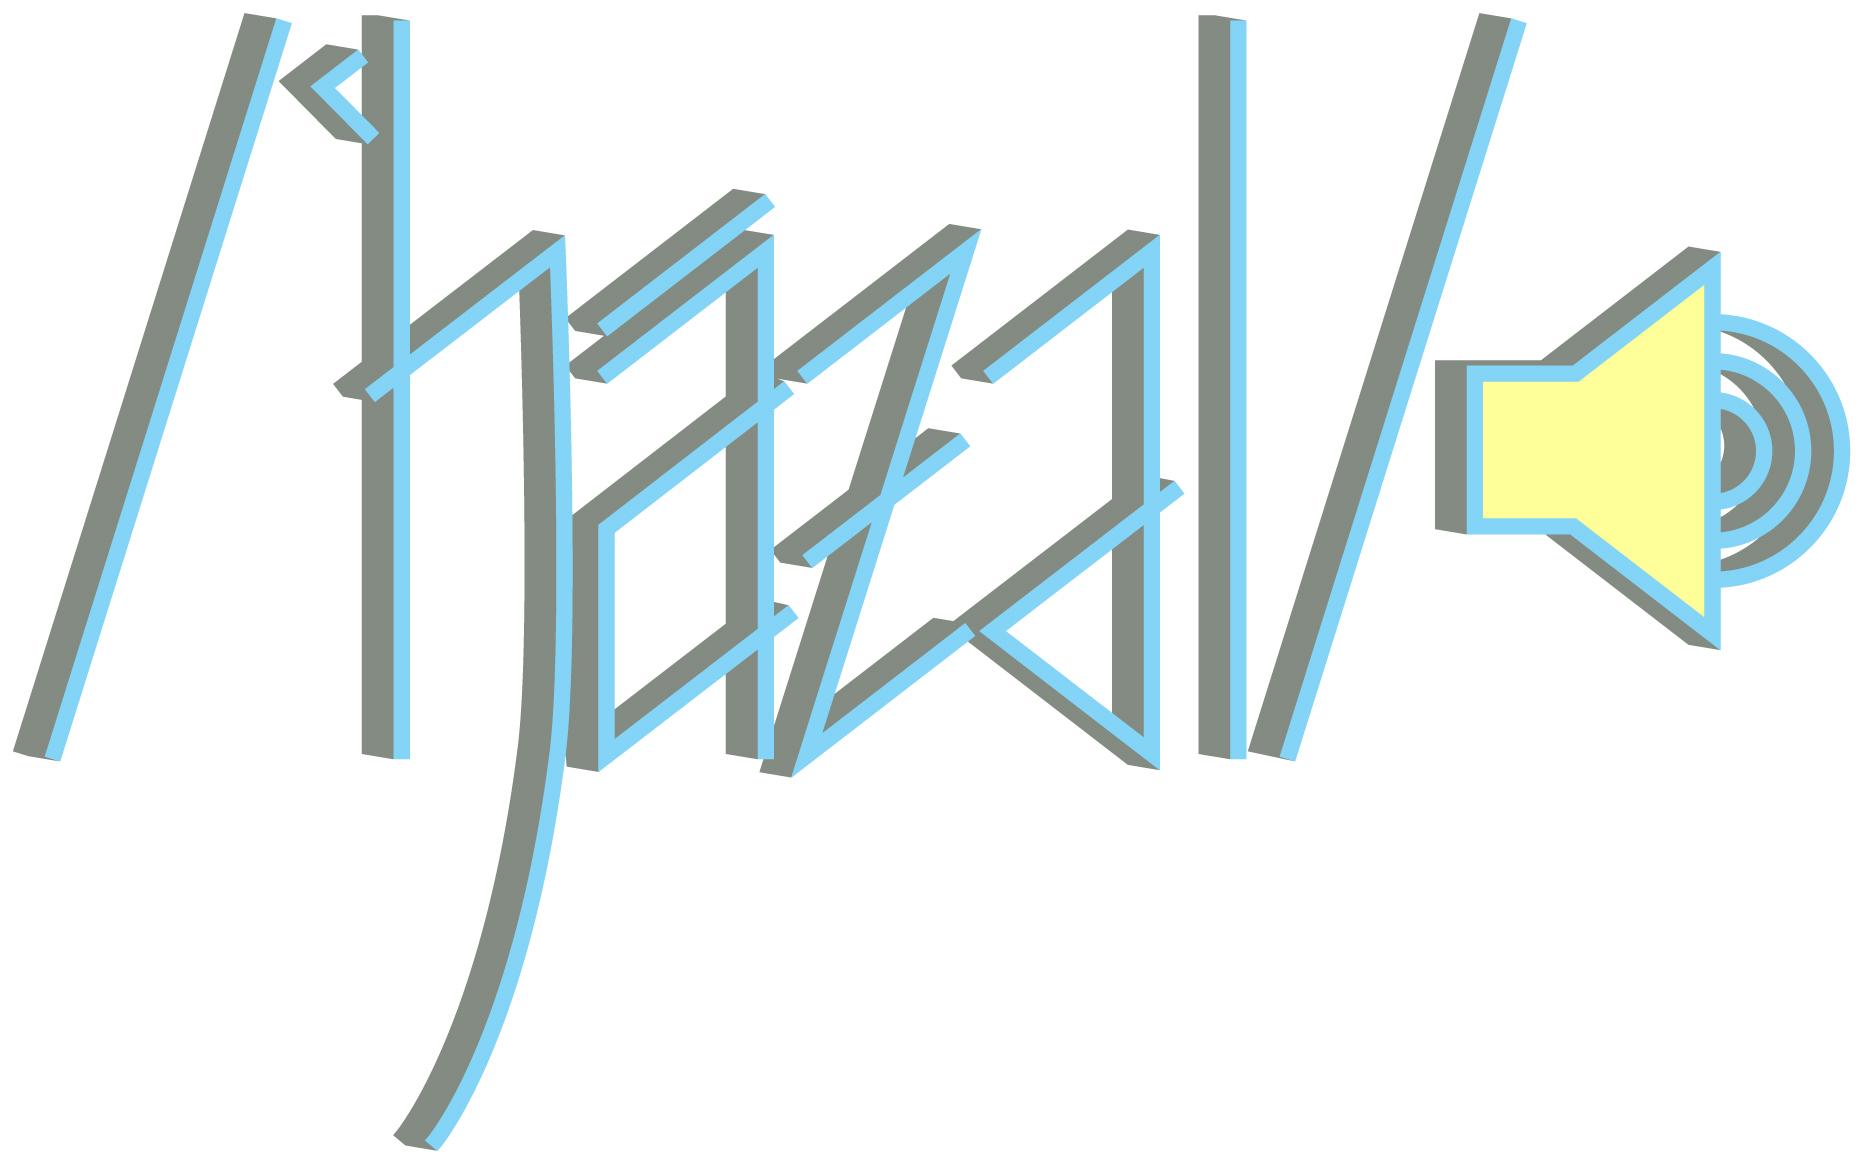 hazel_typeface_04-01.jpg